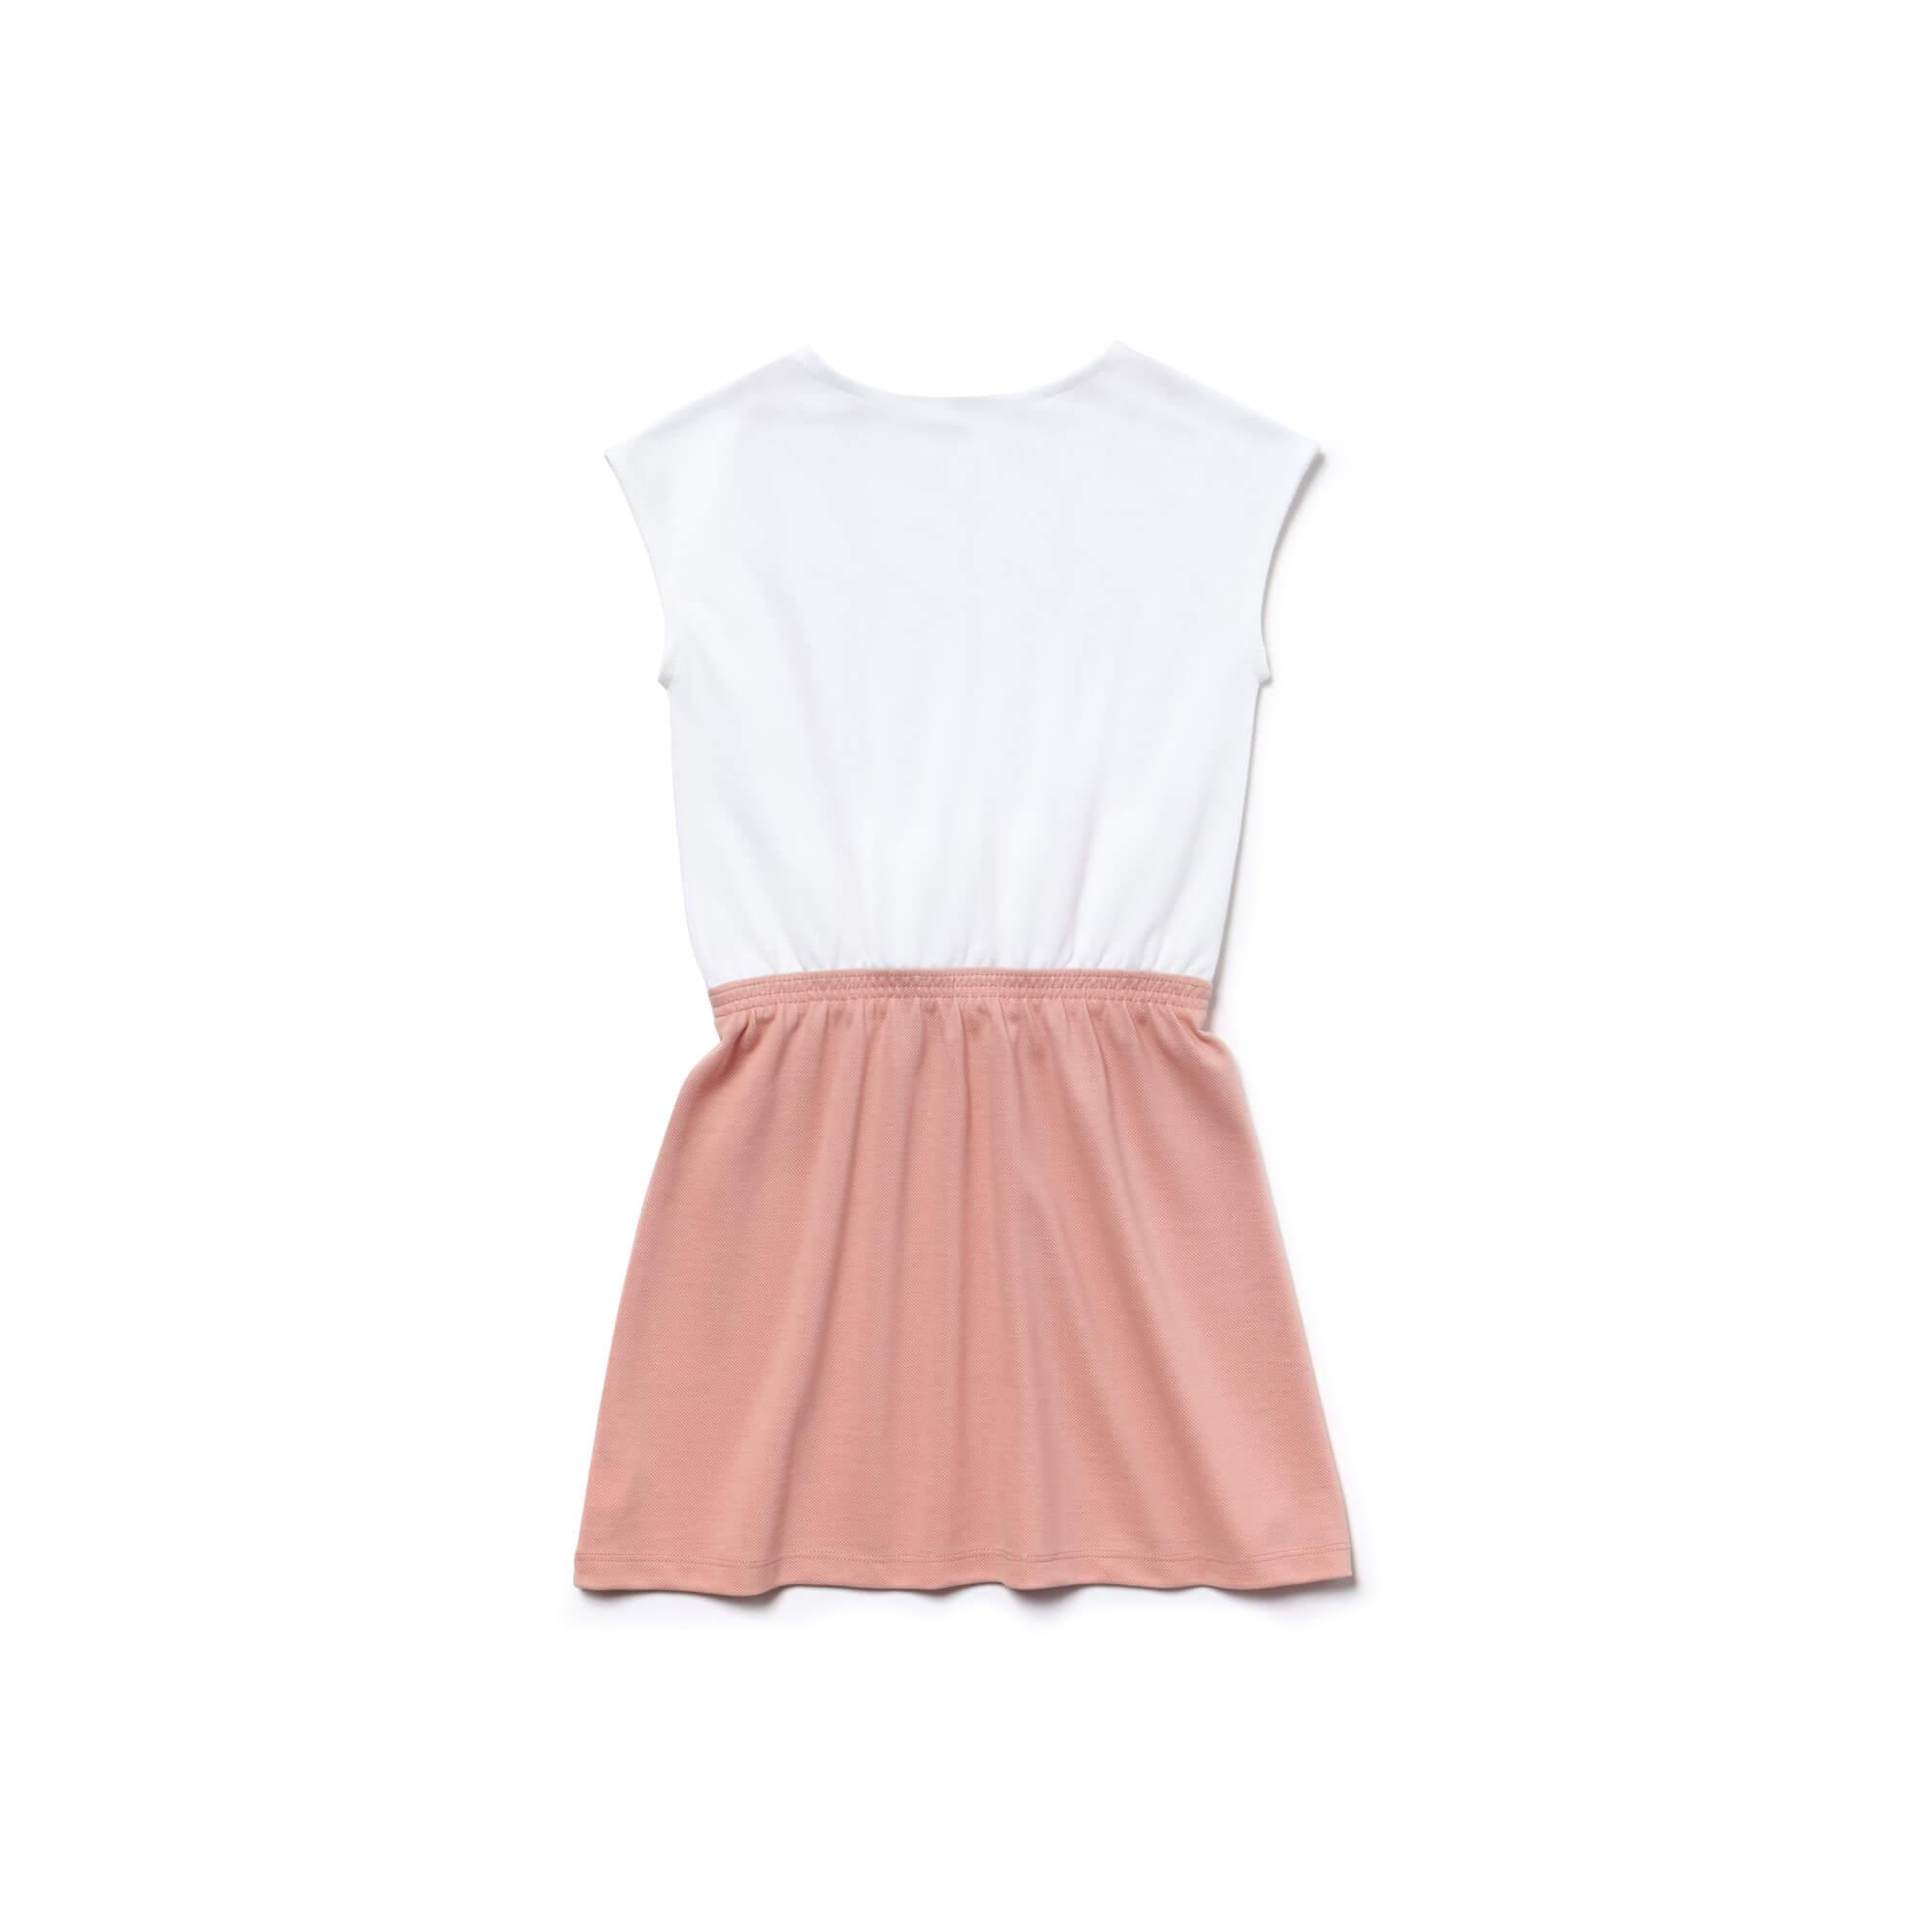 Lacoste Kız Çocuk Pembe Elbise